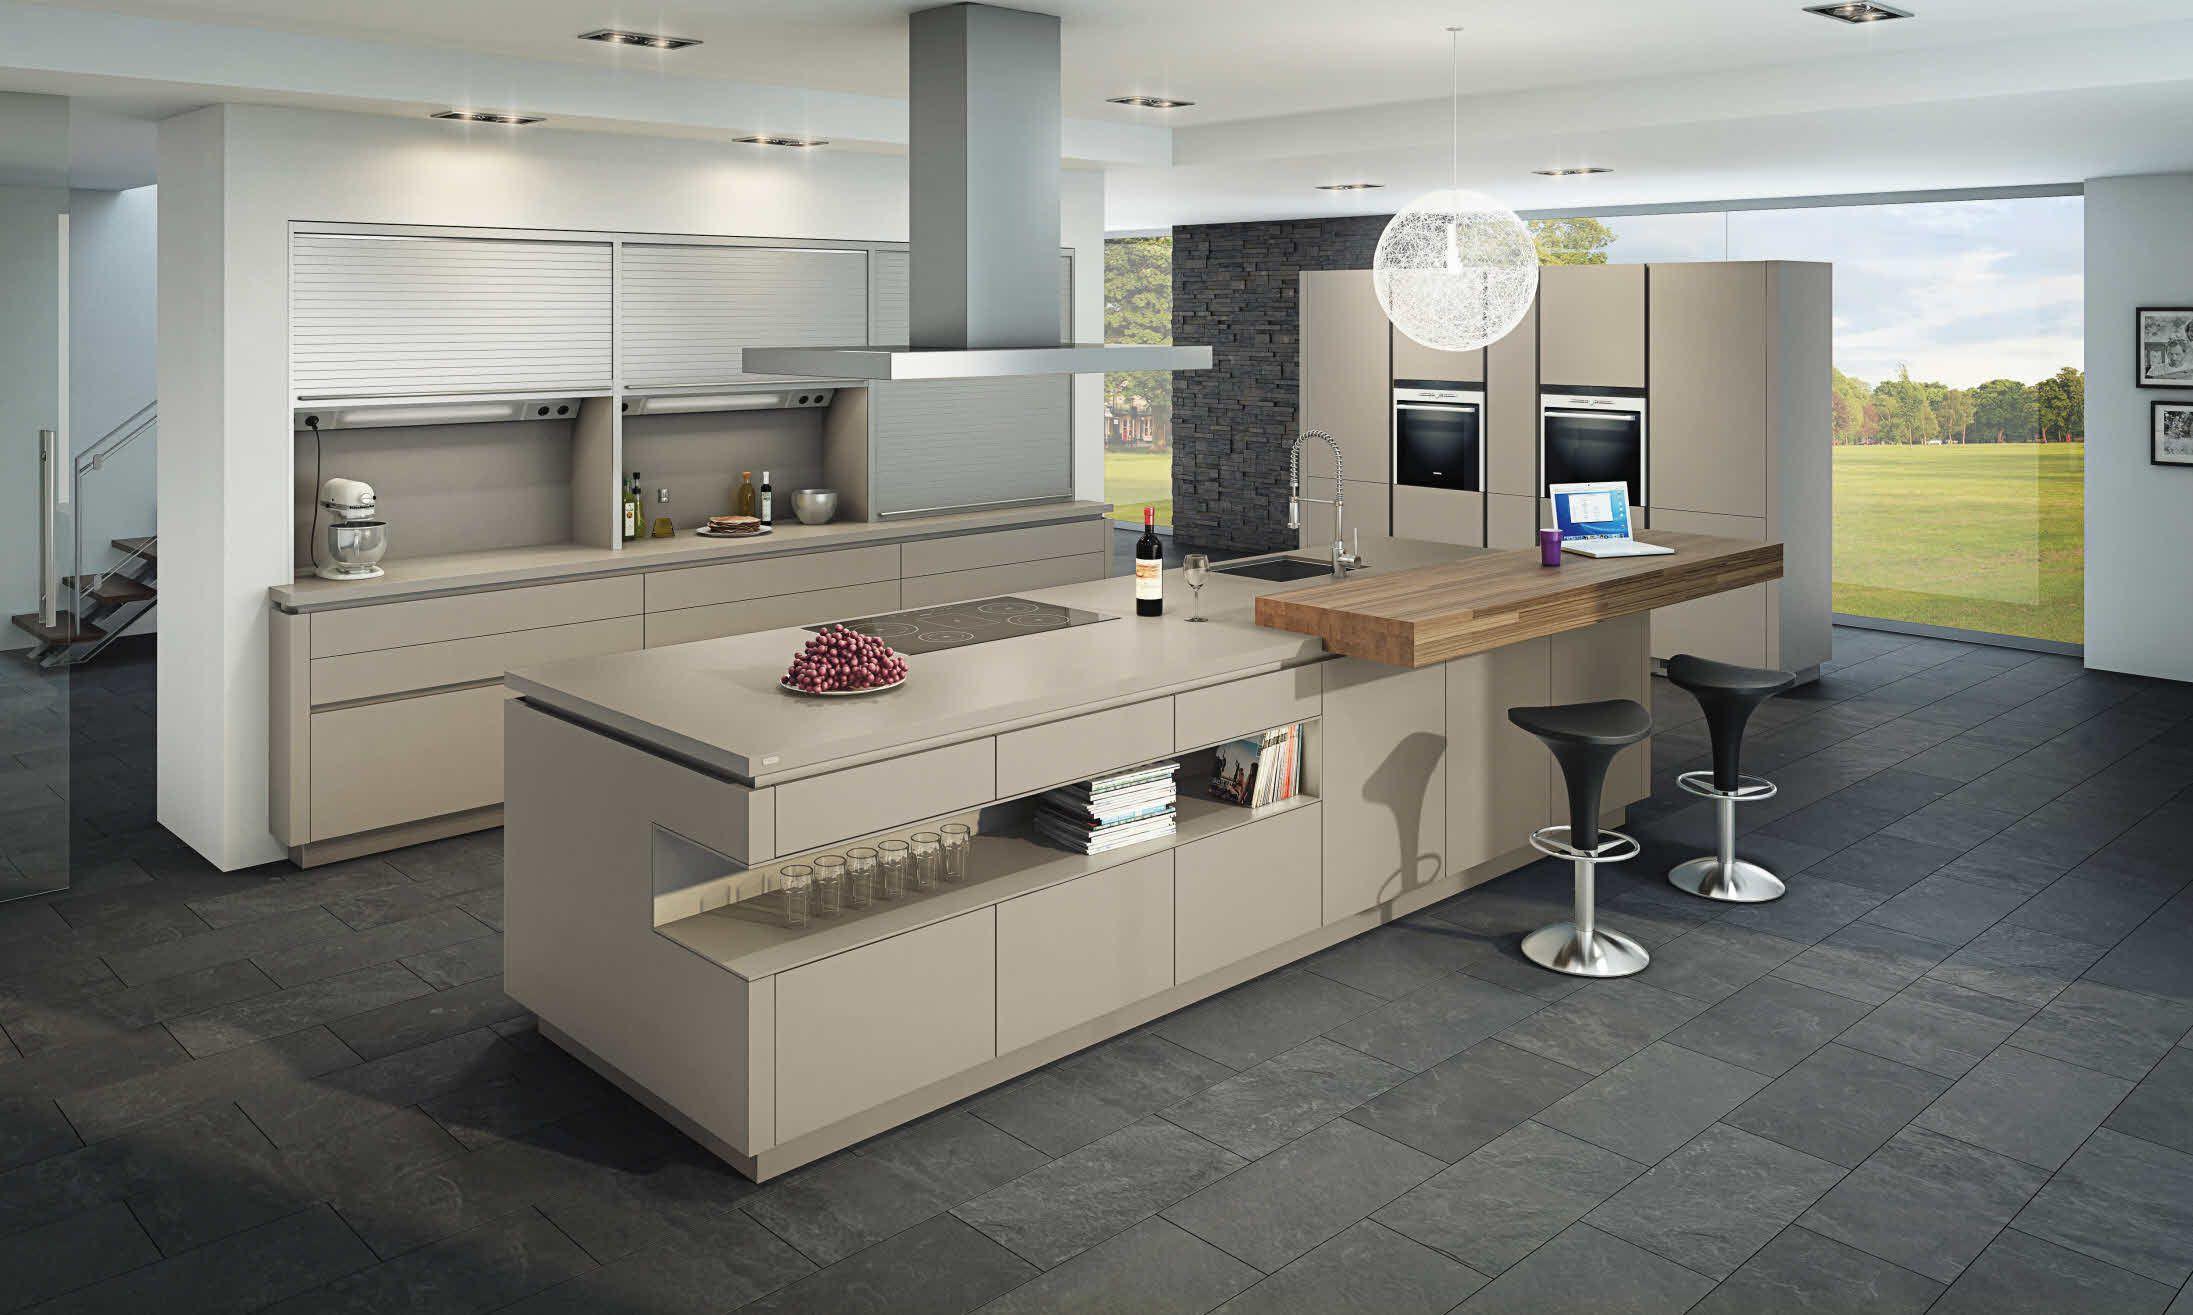 k che google suche k chen pinterest suche google und k che. Black Bedroom Furniture Sets. Home Design Ideas